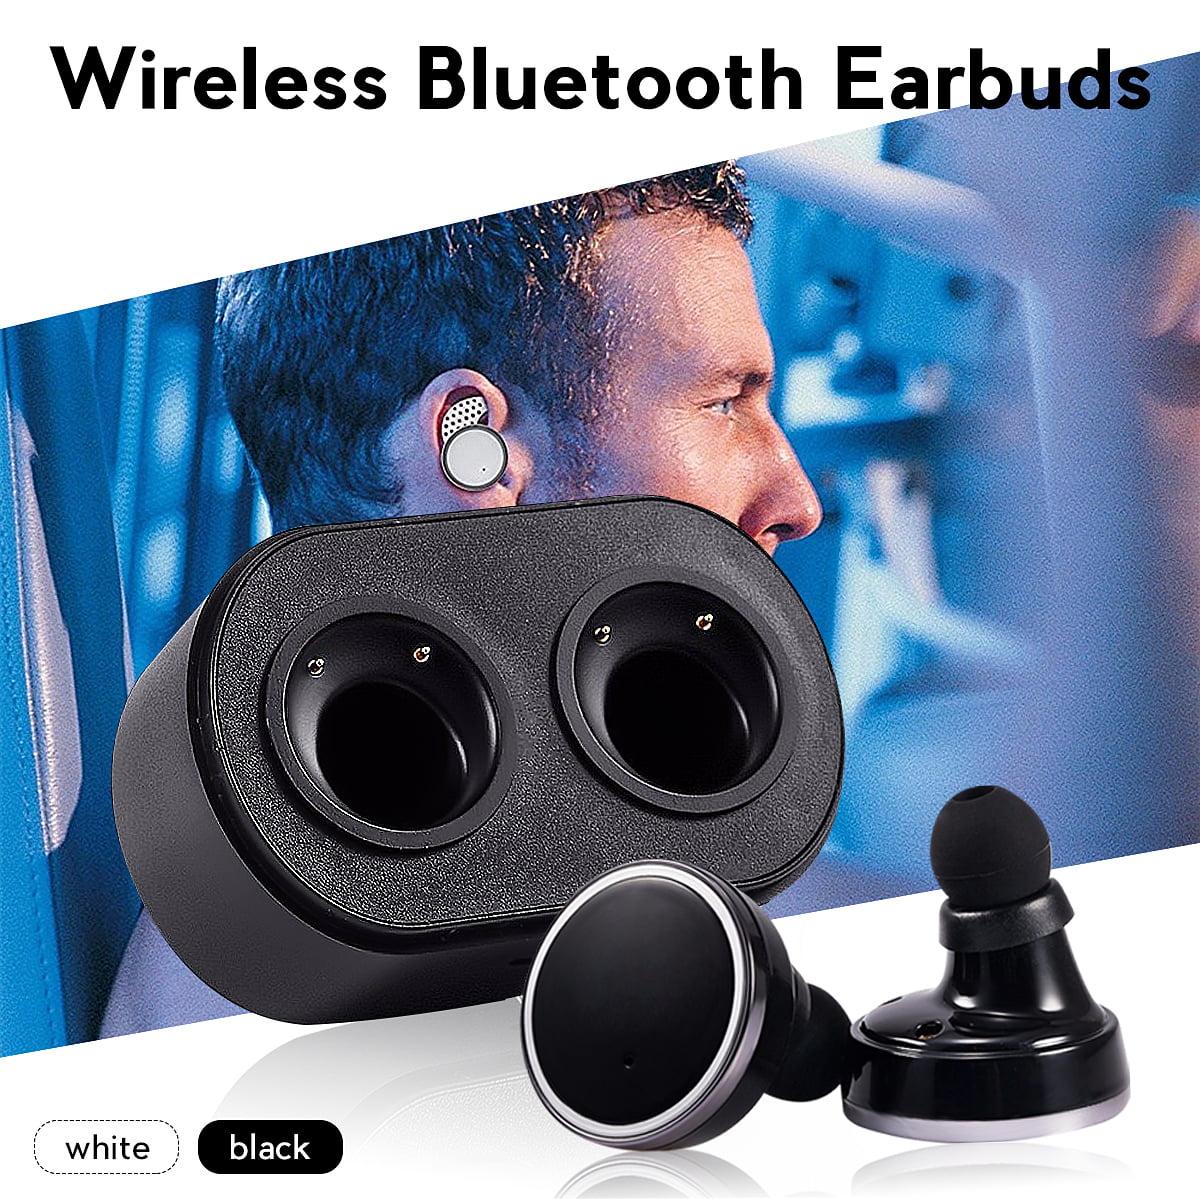 Mini Wireless Bluetooth V4.1 Stereo Hidden Earbuds Headphones Earphones for Apple